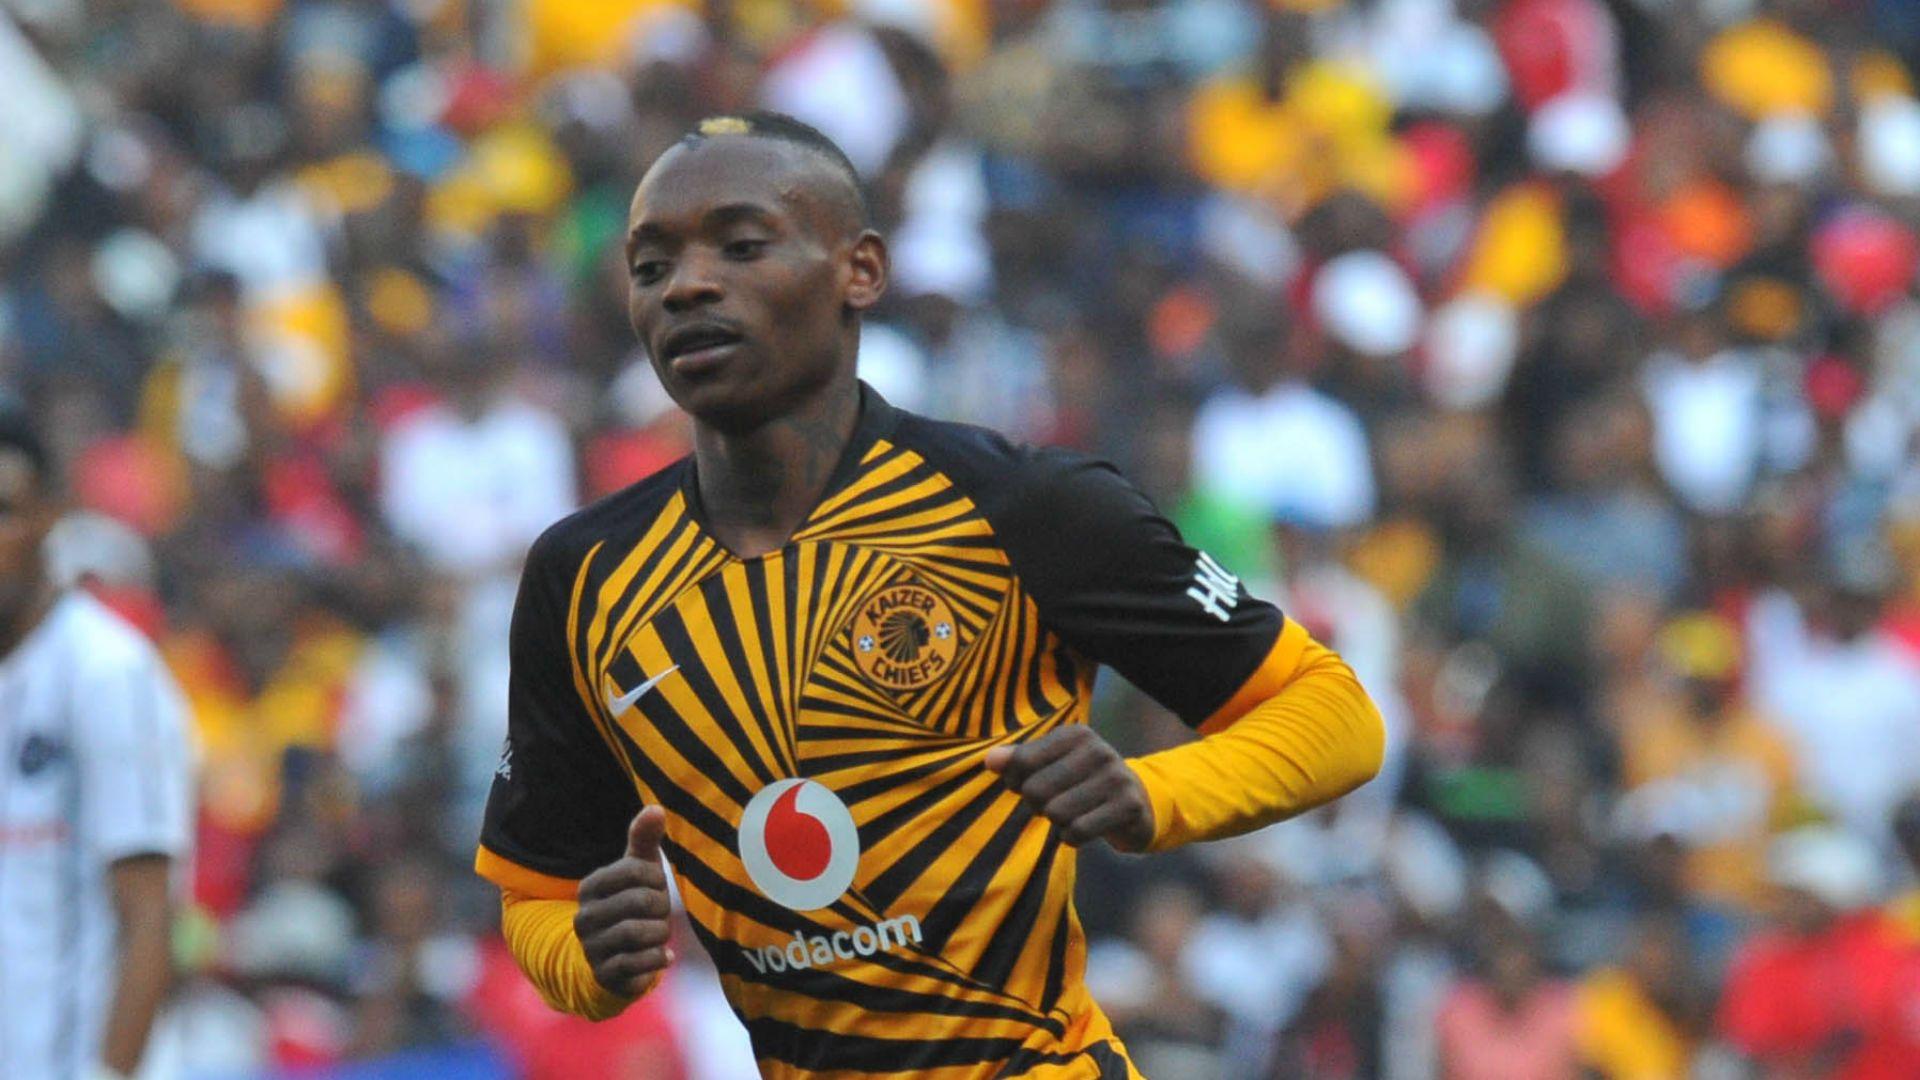 Kaizer Chiefs Forward Billiat Breaks Silence On Mamelodi Sundowns Interest The Amakhosi Talisman Has Discussed His Kaizer Chiefs Premier Soccer Soccer League